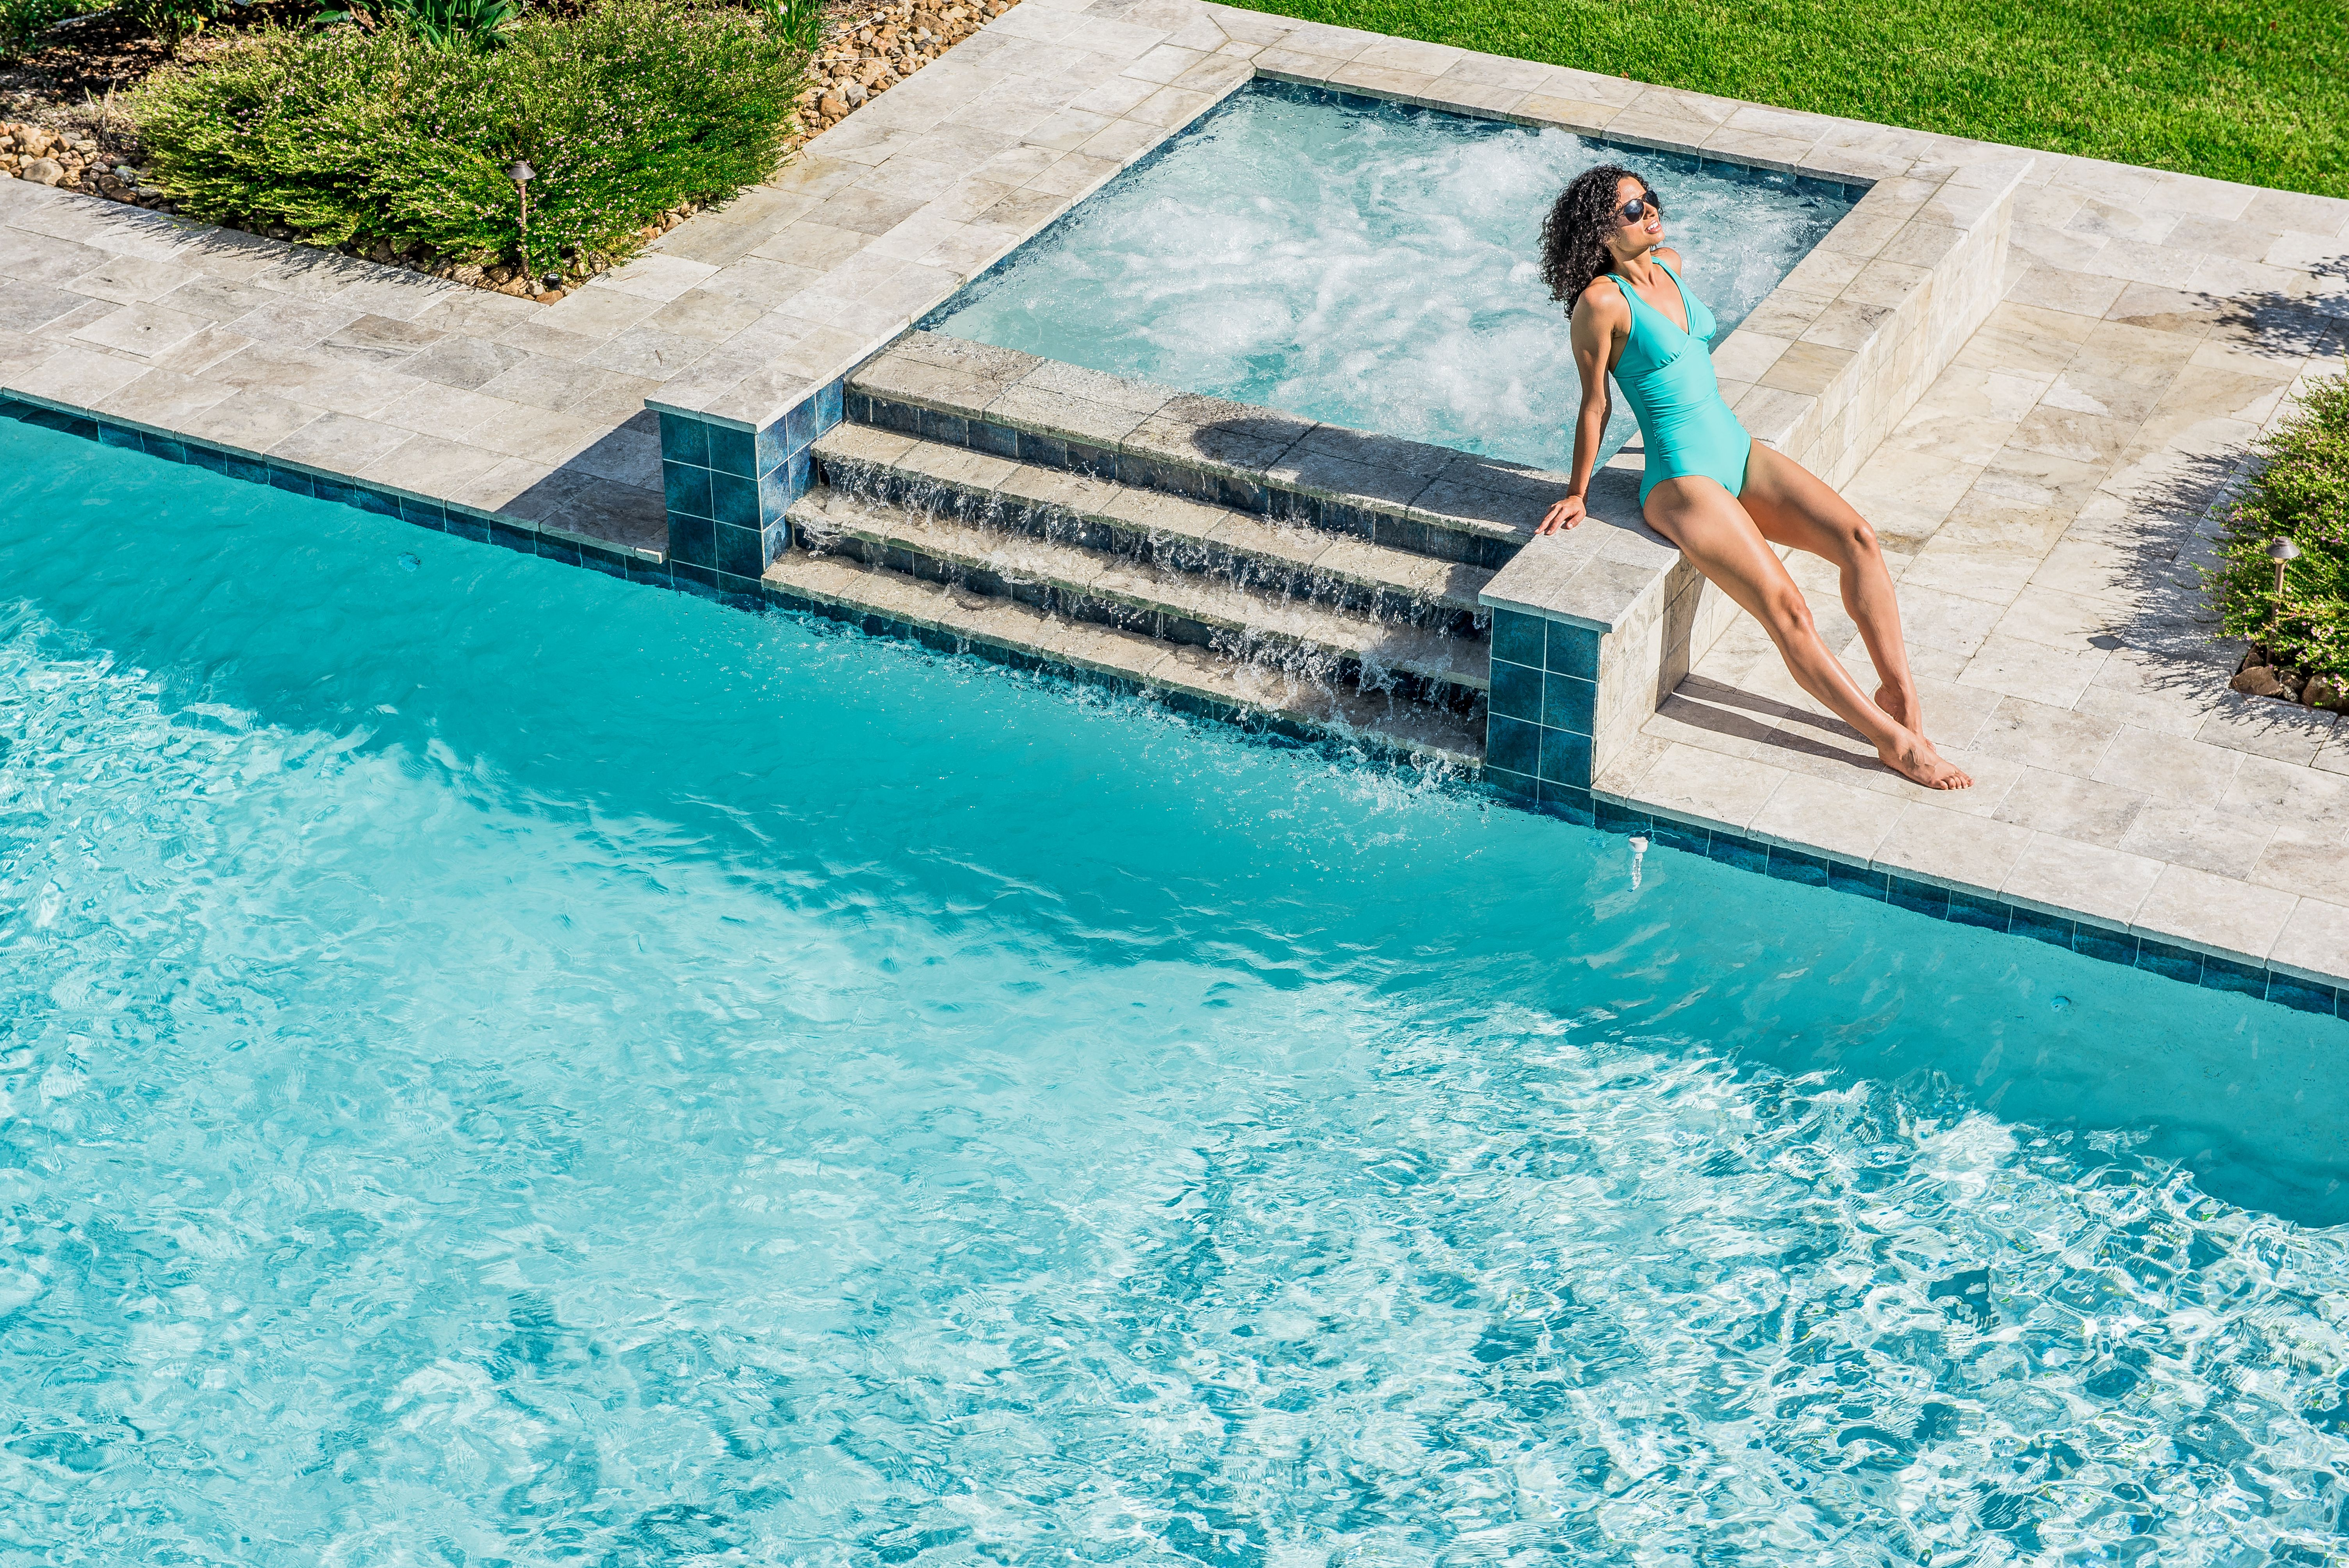 geometric pool spa geometric pool spa pool pool